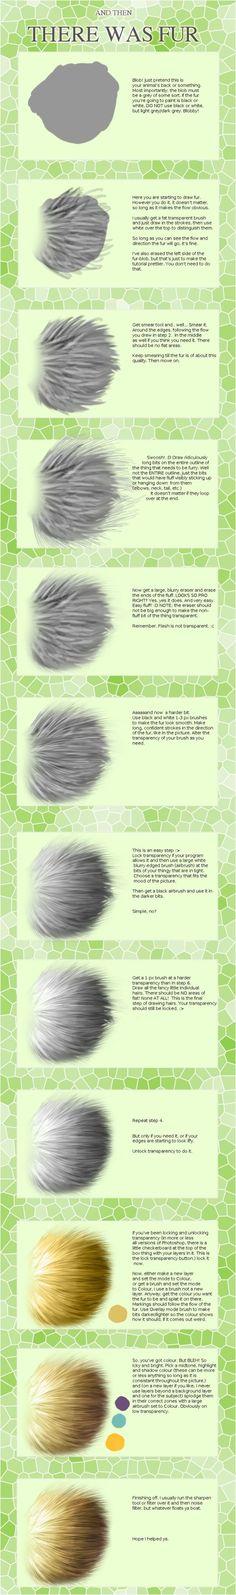 Fur  painting